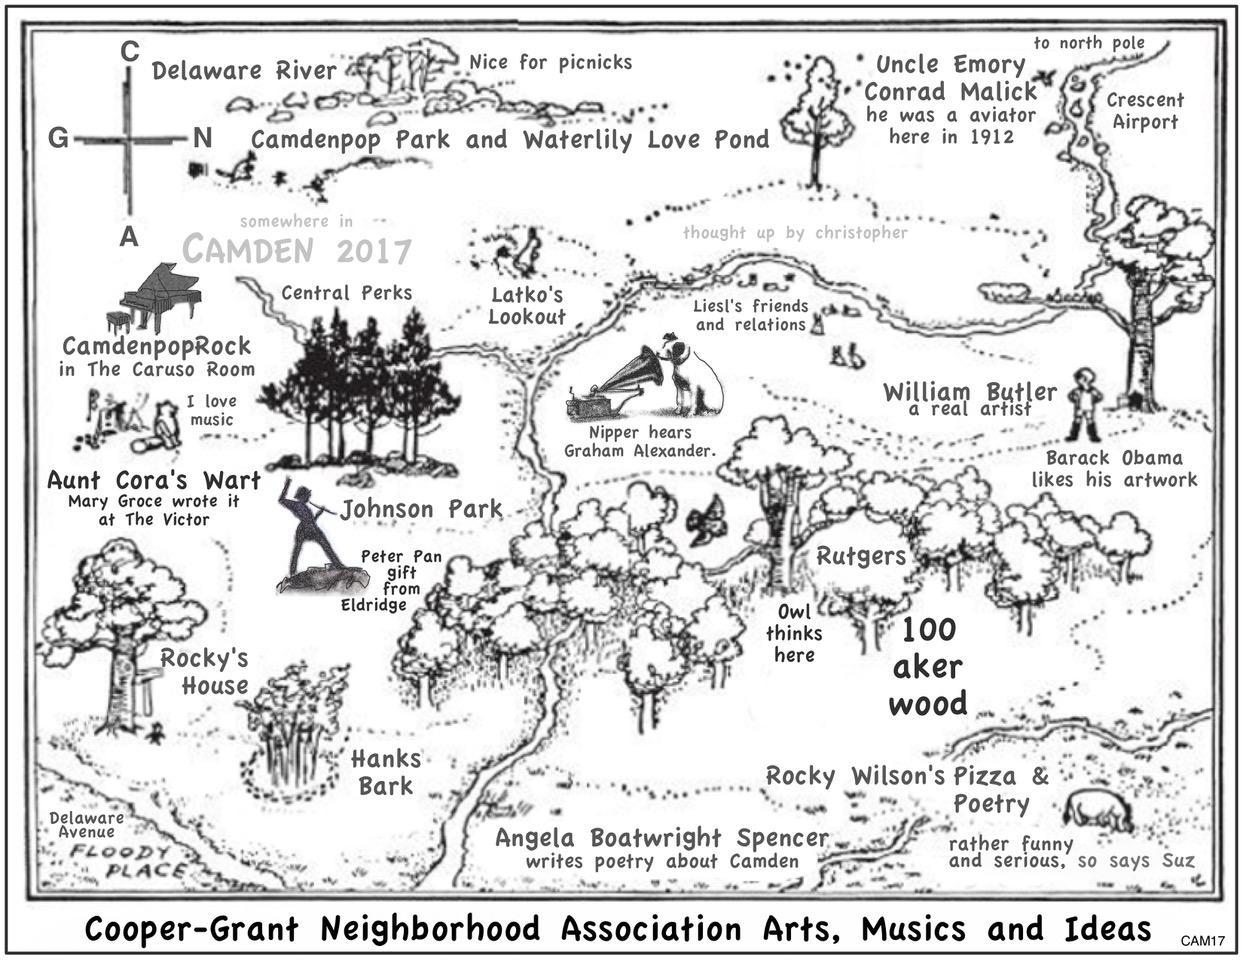 Author/admin/page/3 - Cooper Grant Neighborhood Association Arts Flyer Featuring Camdenpoprock